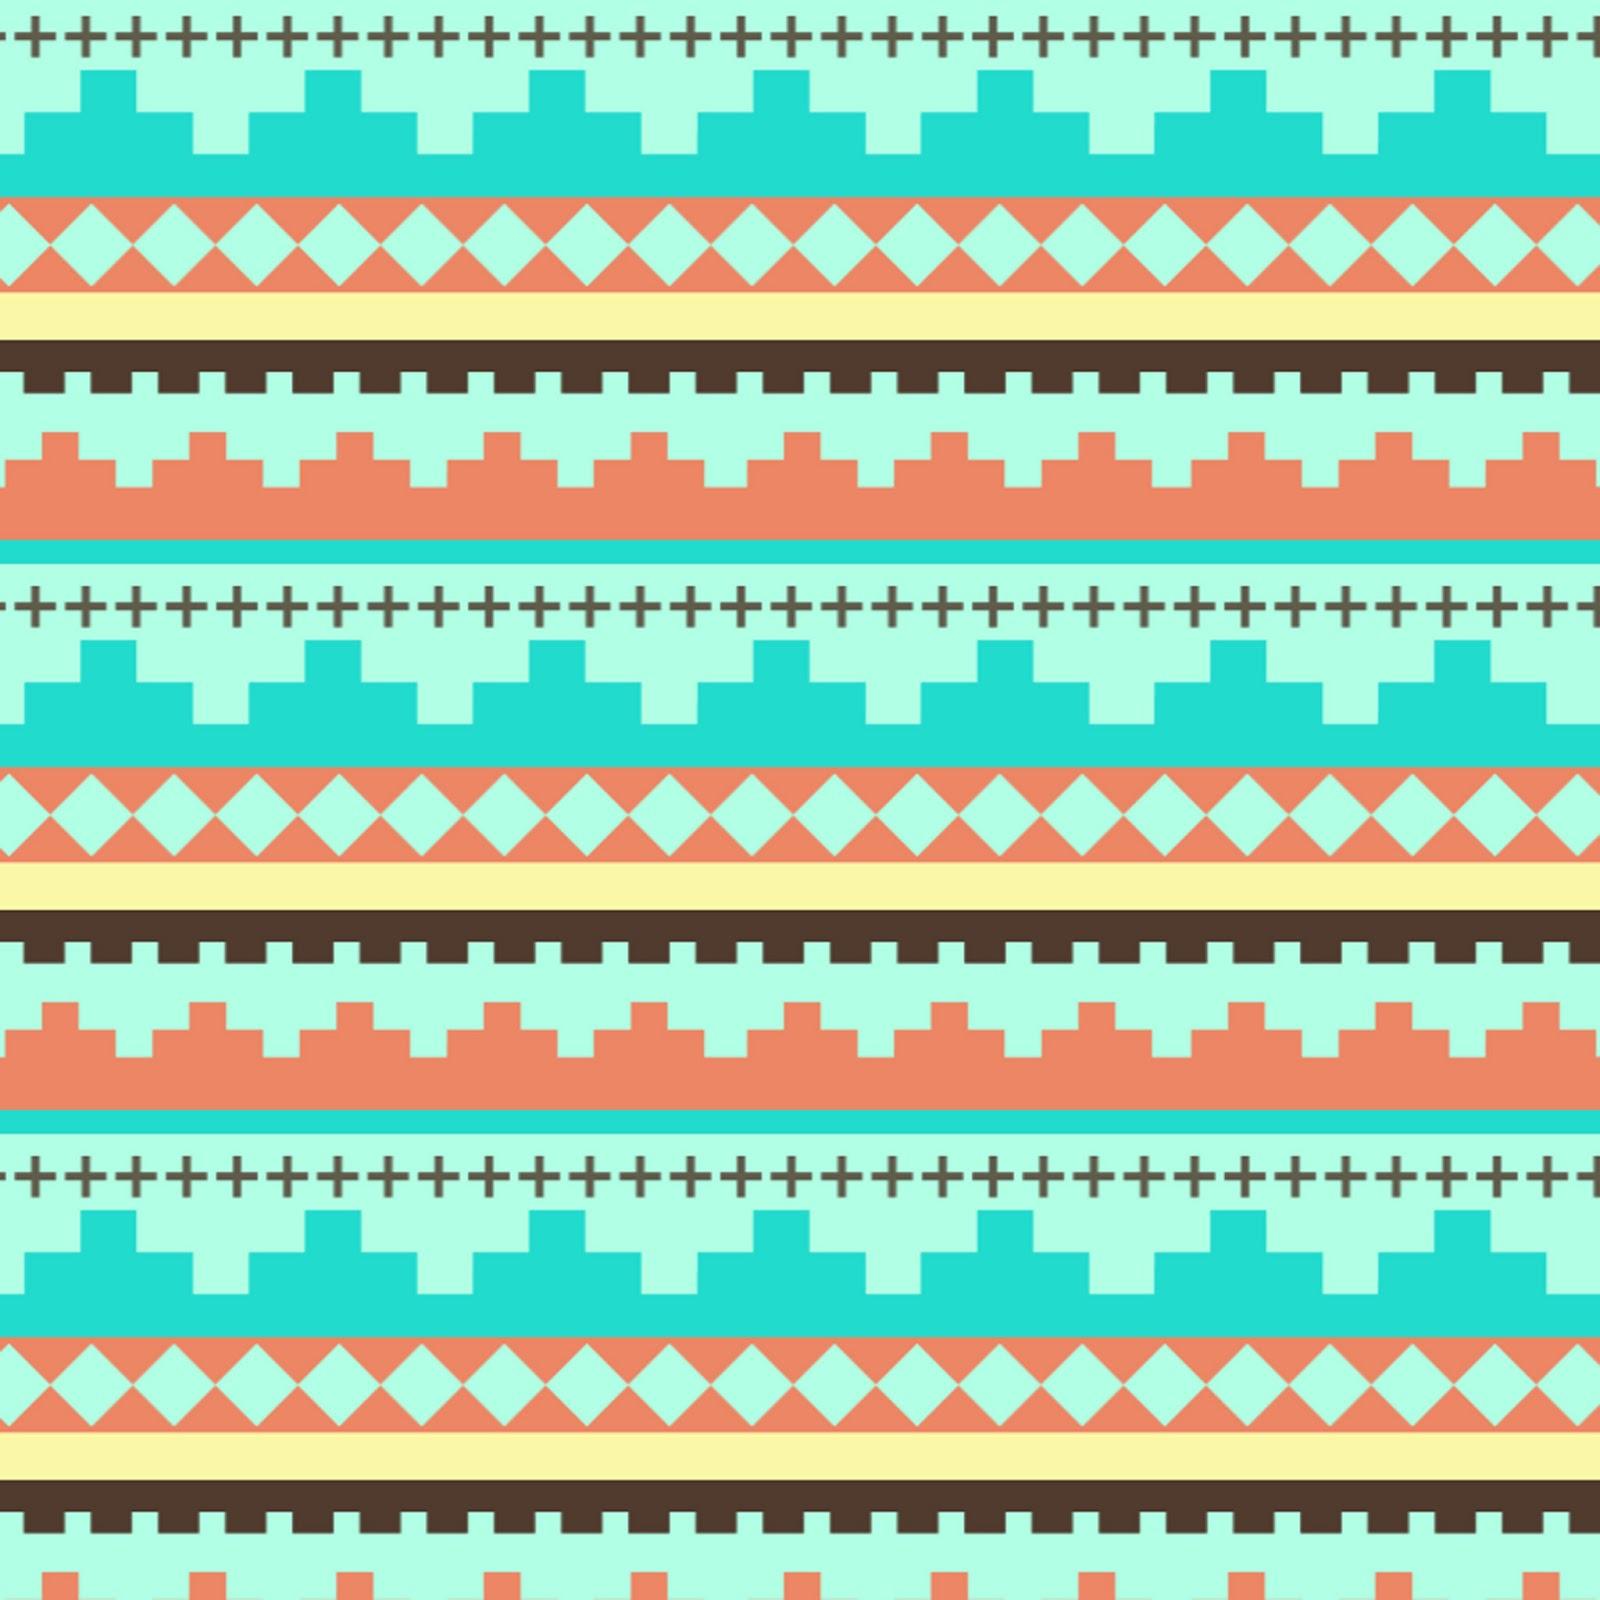 Doodlecraft Colorful Geometric Freebies